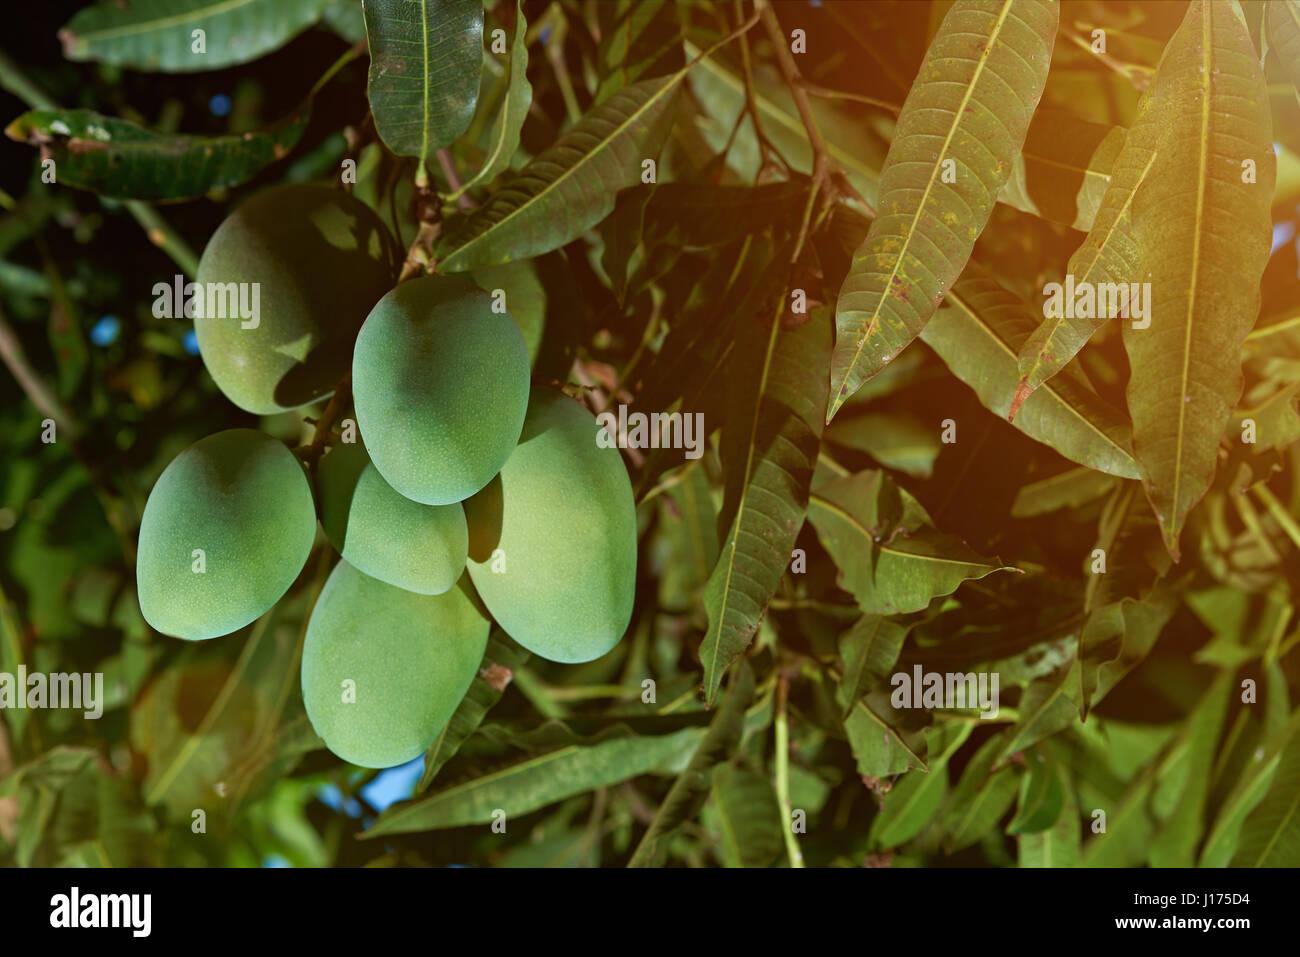 Costa Rica Mango Stock Photos & Costa Rica Mango Stock Images - Alamy